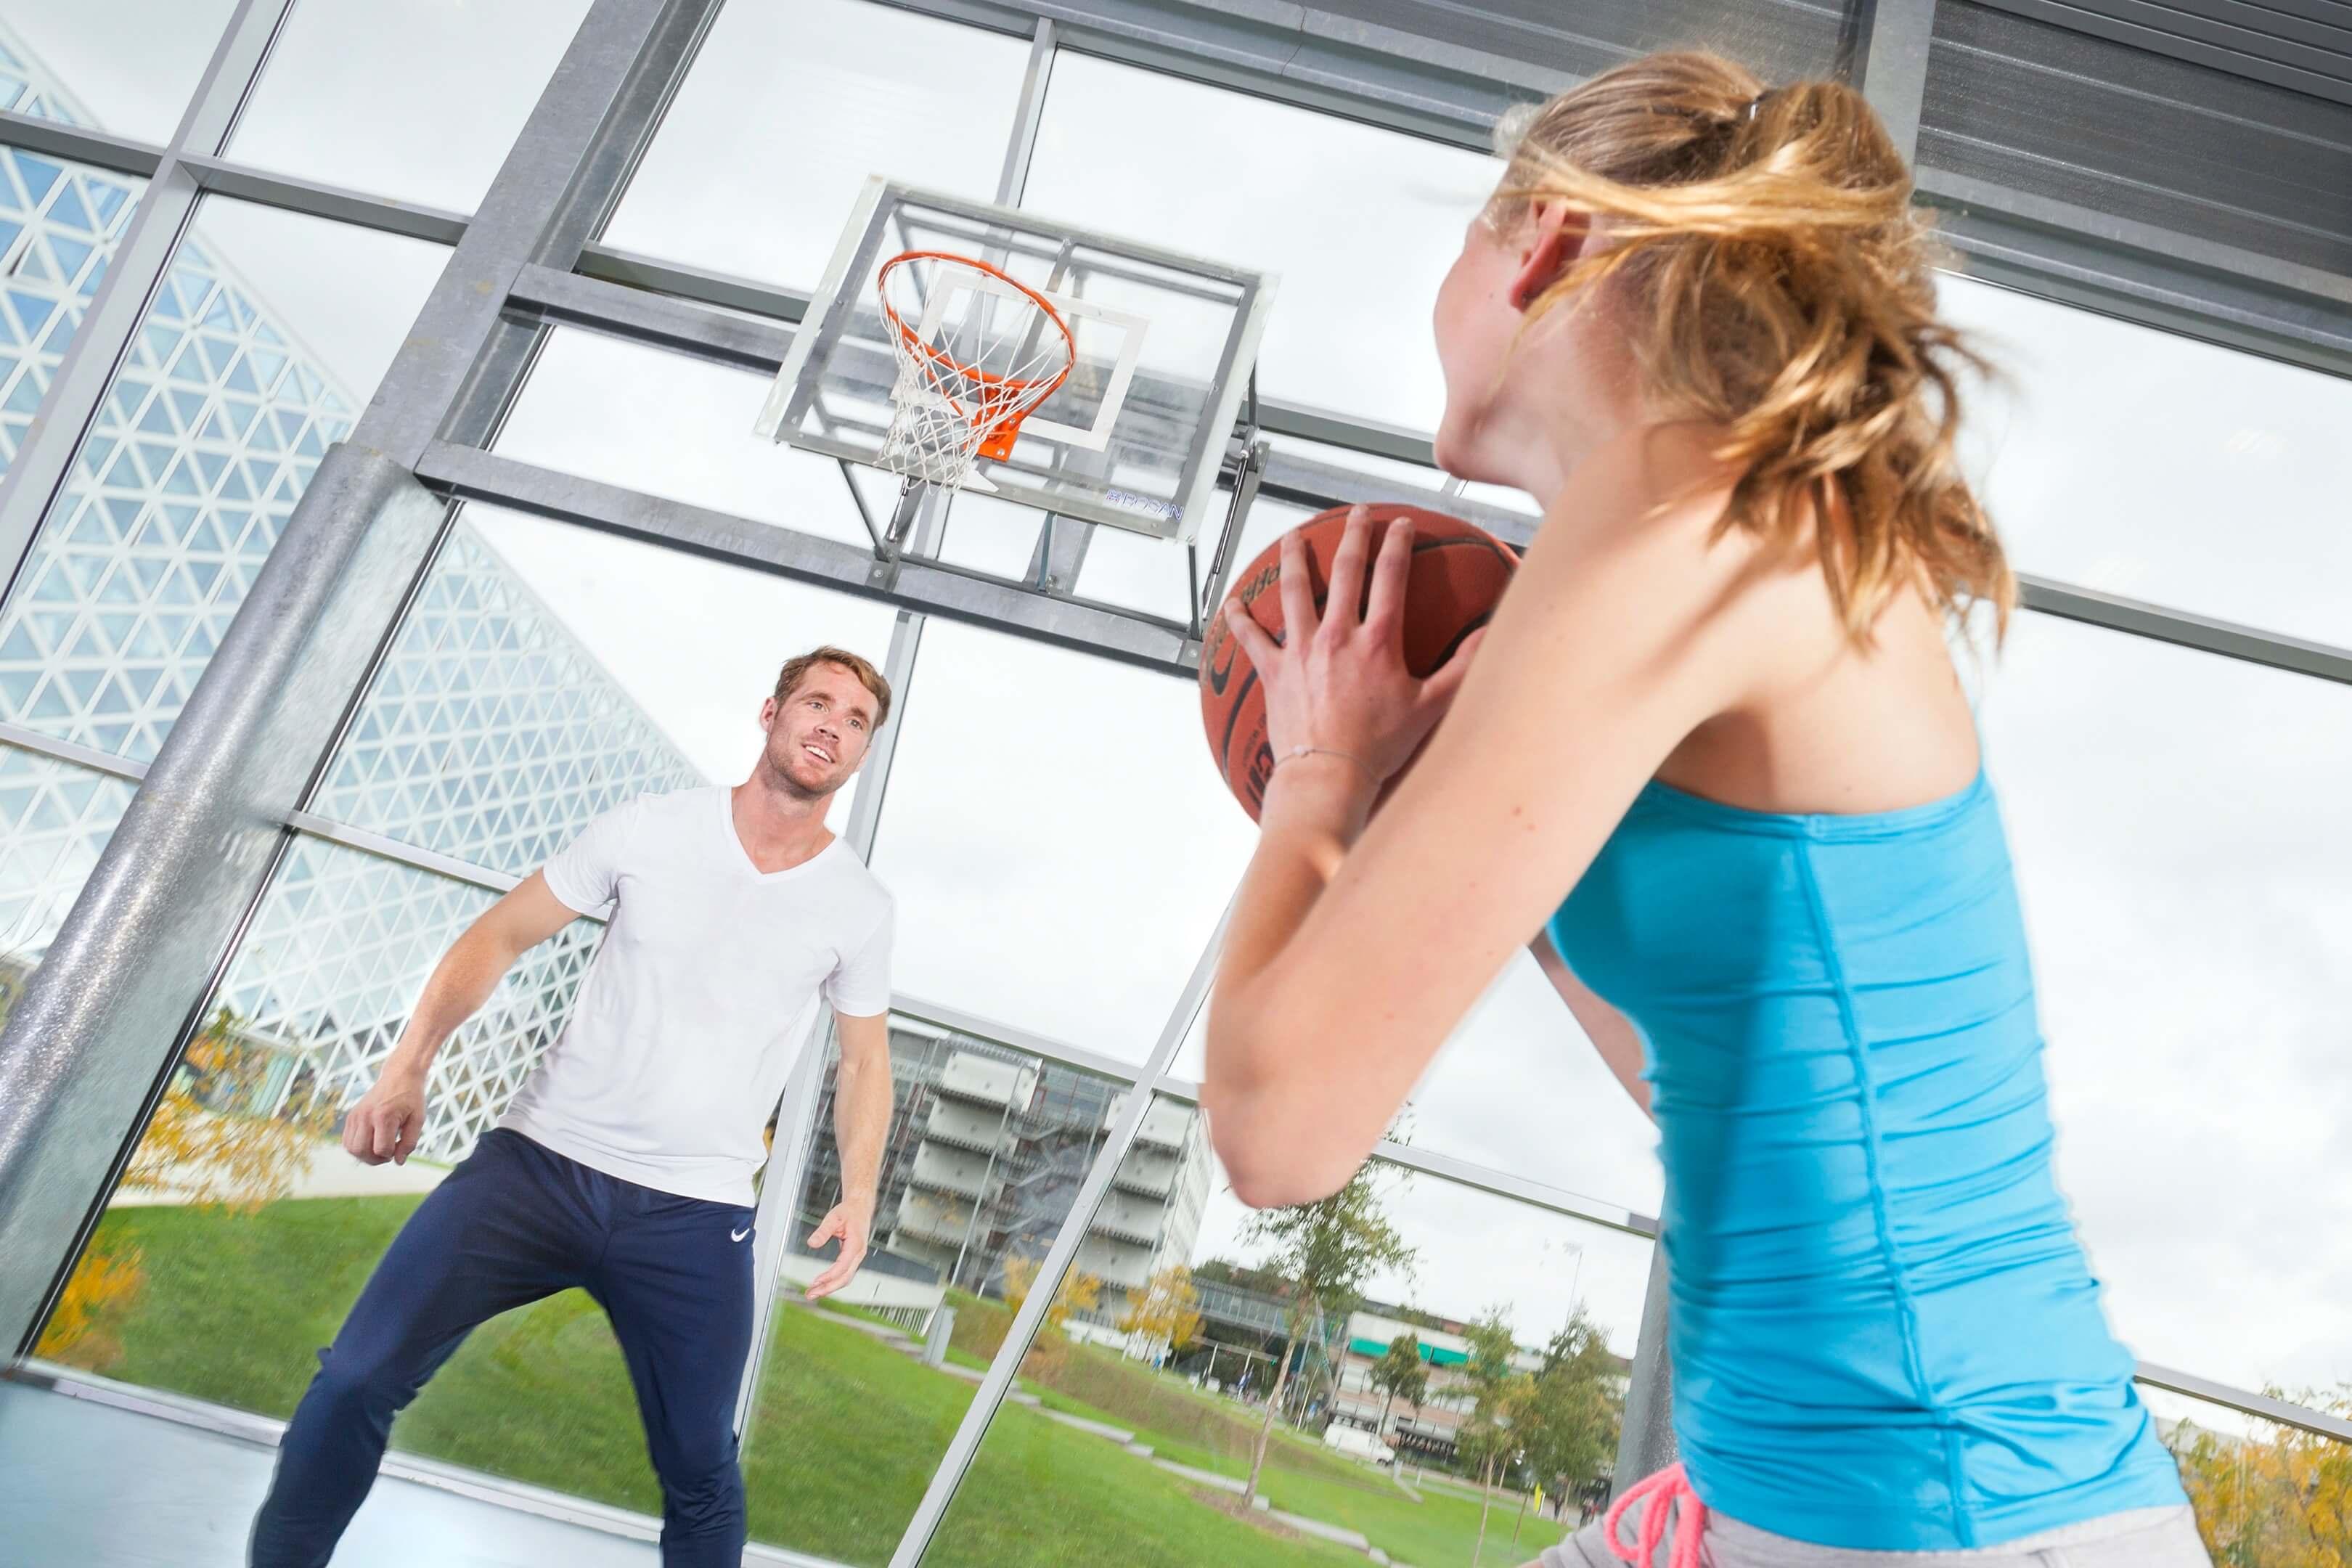 Hogeschool Windesheim Jurjen Poeles fotografie beeldbank spart basketbal